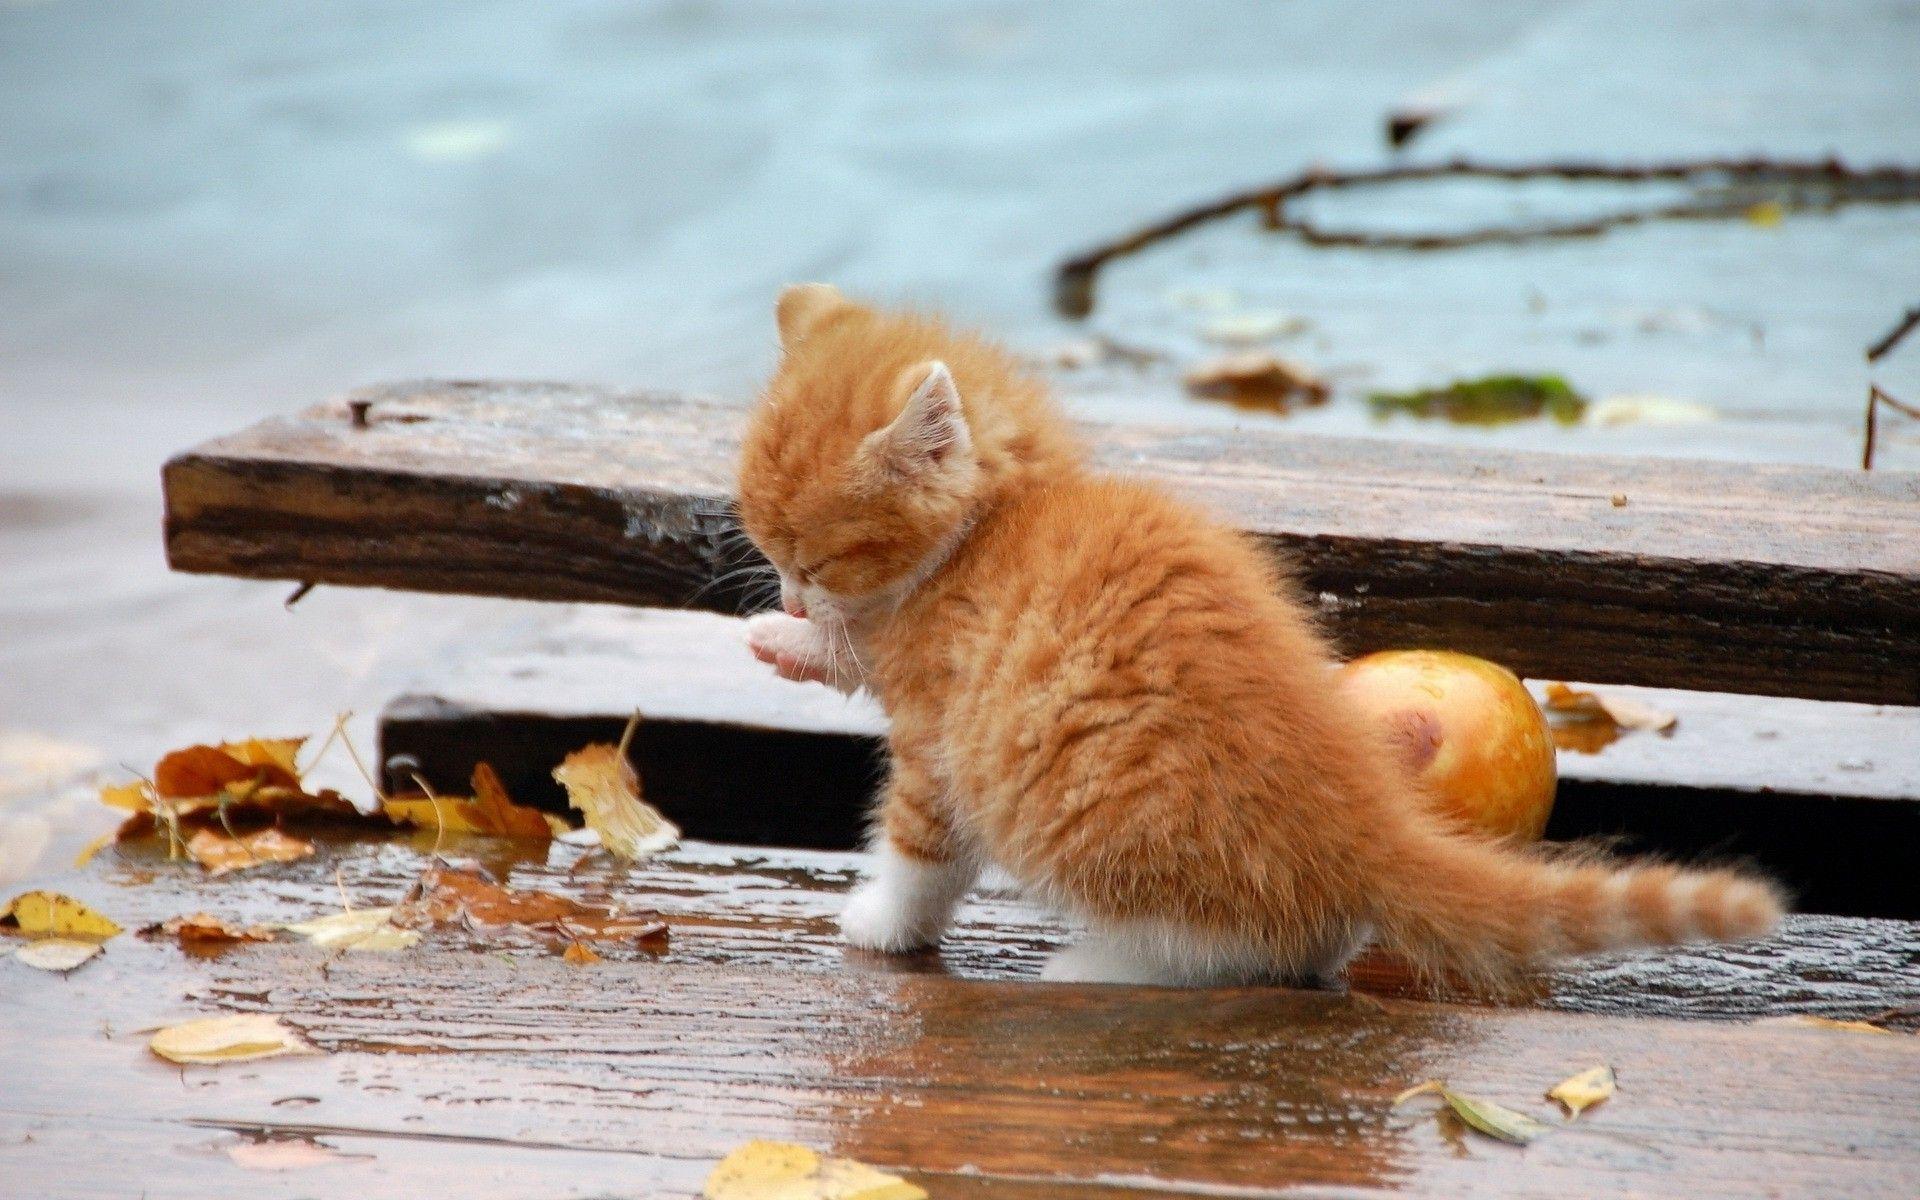 Animals Cats Kittens Wallpaper 2600469 Wallbase Cc Orange Kittens Cats Kittens